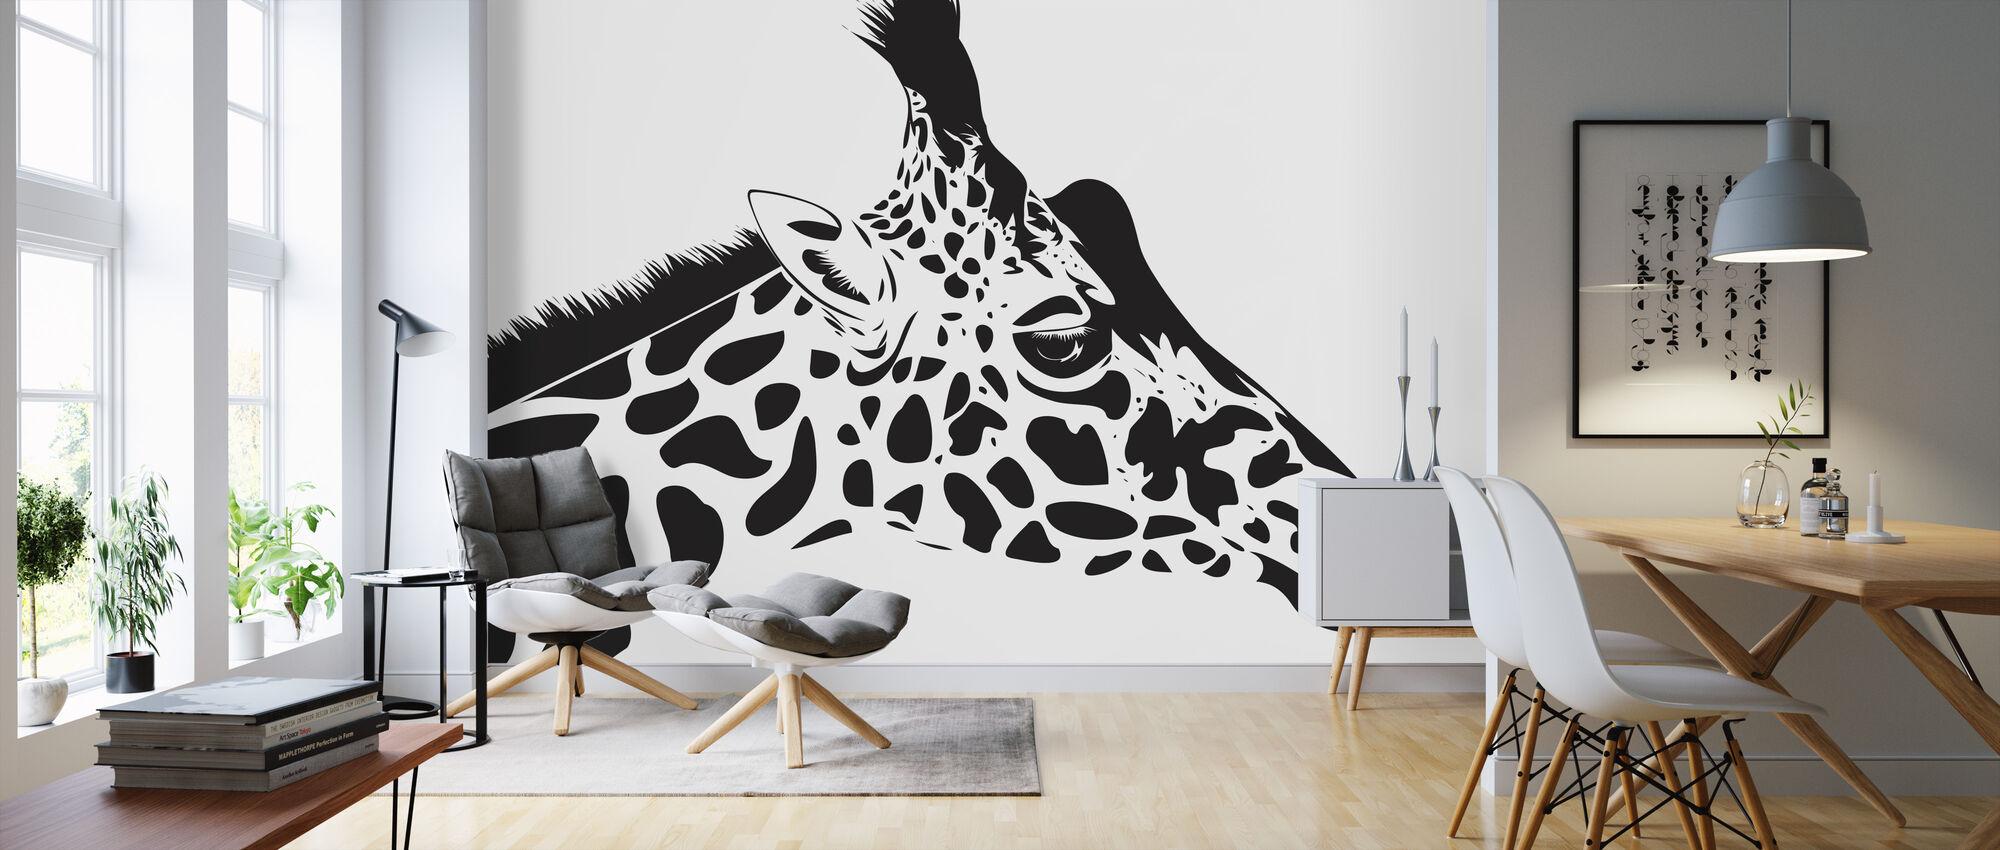 Giraffe - Wallpaper - Living Room